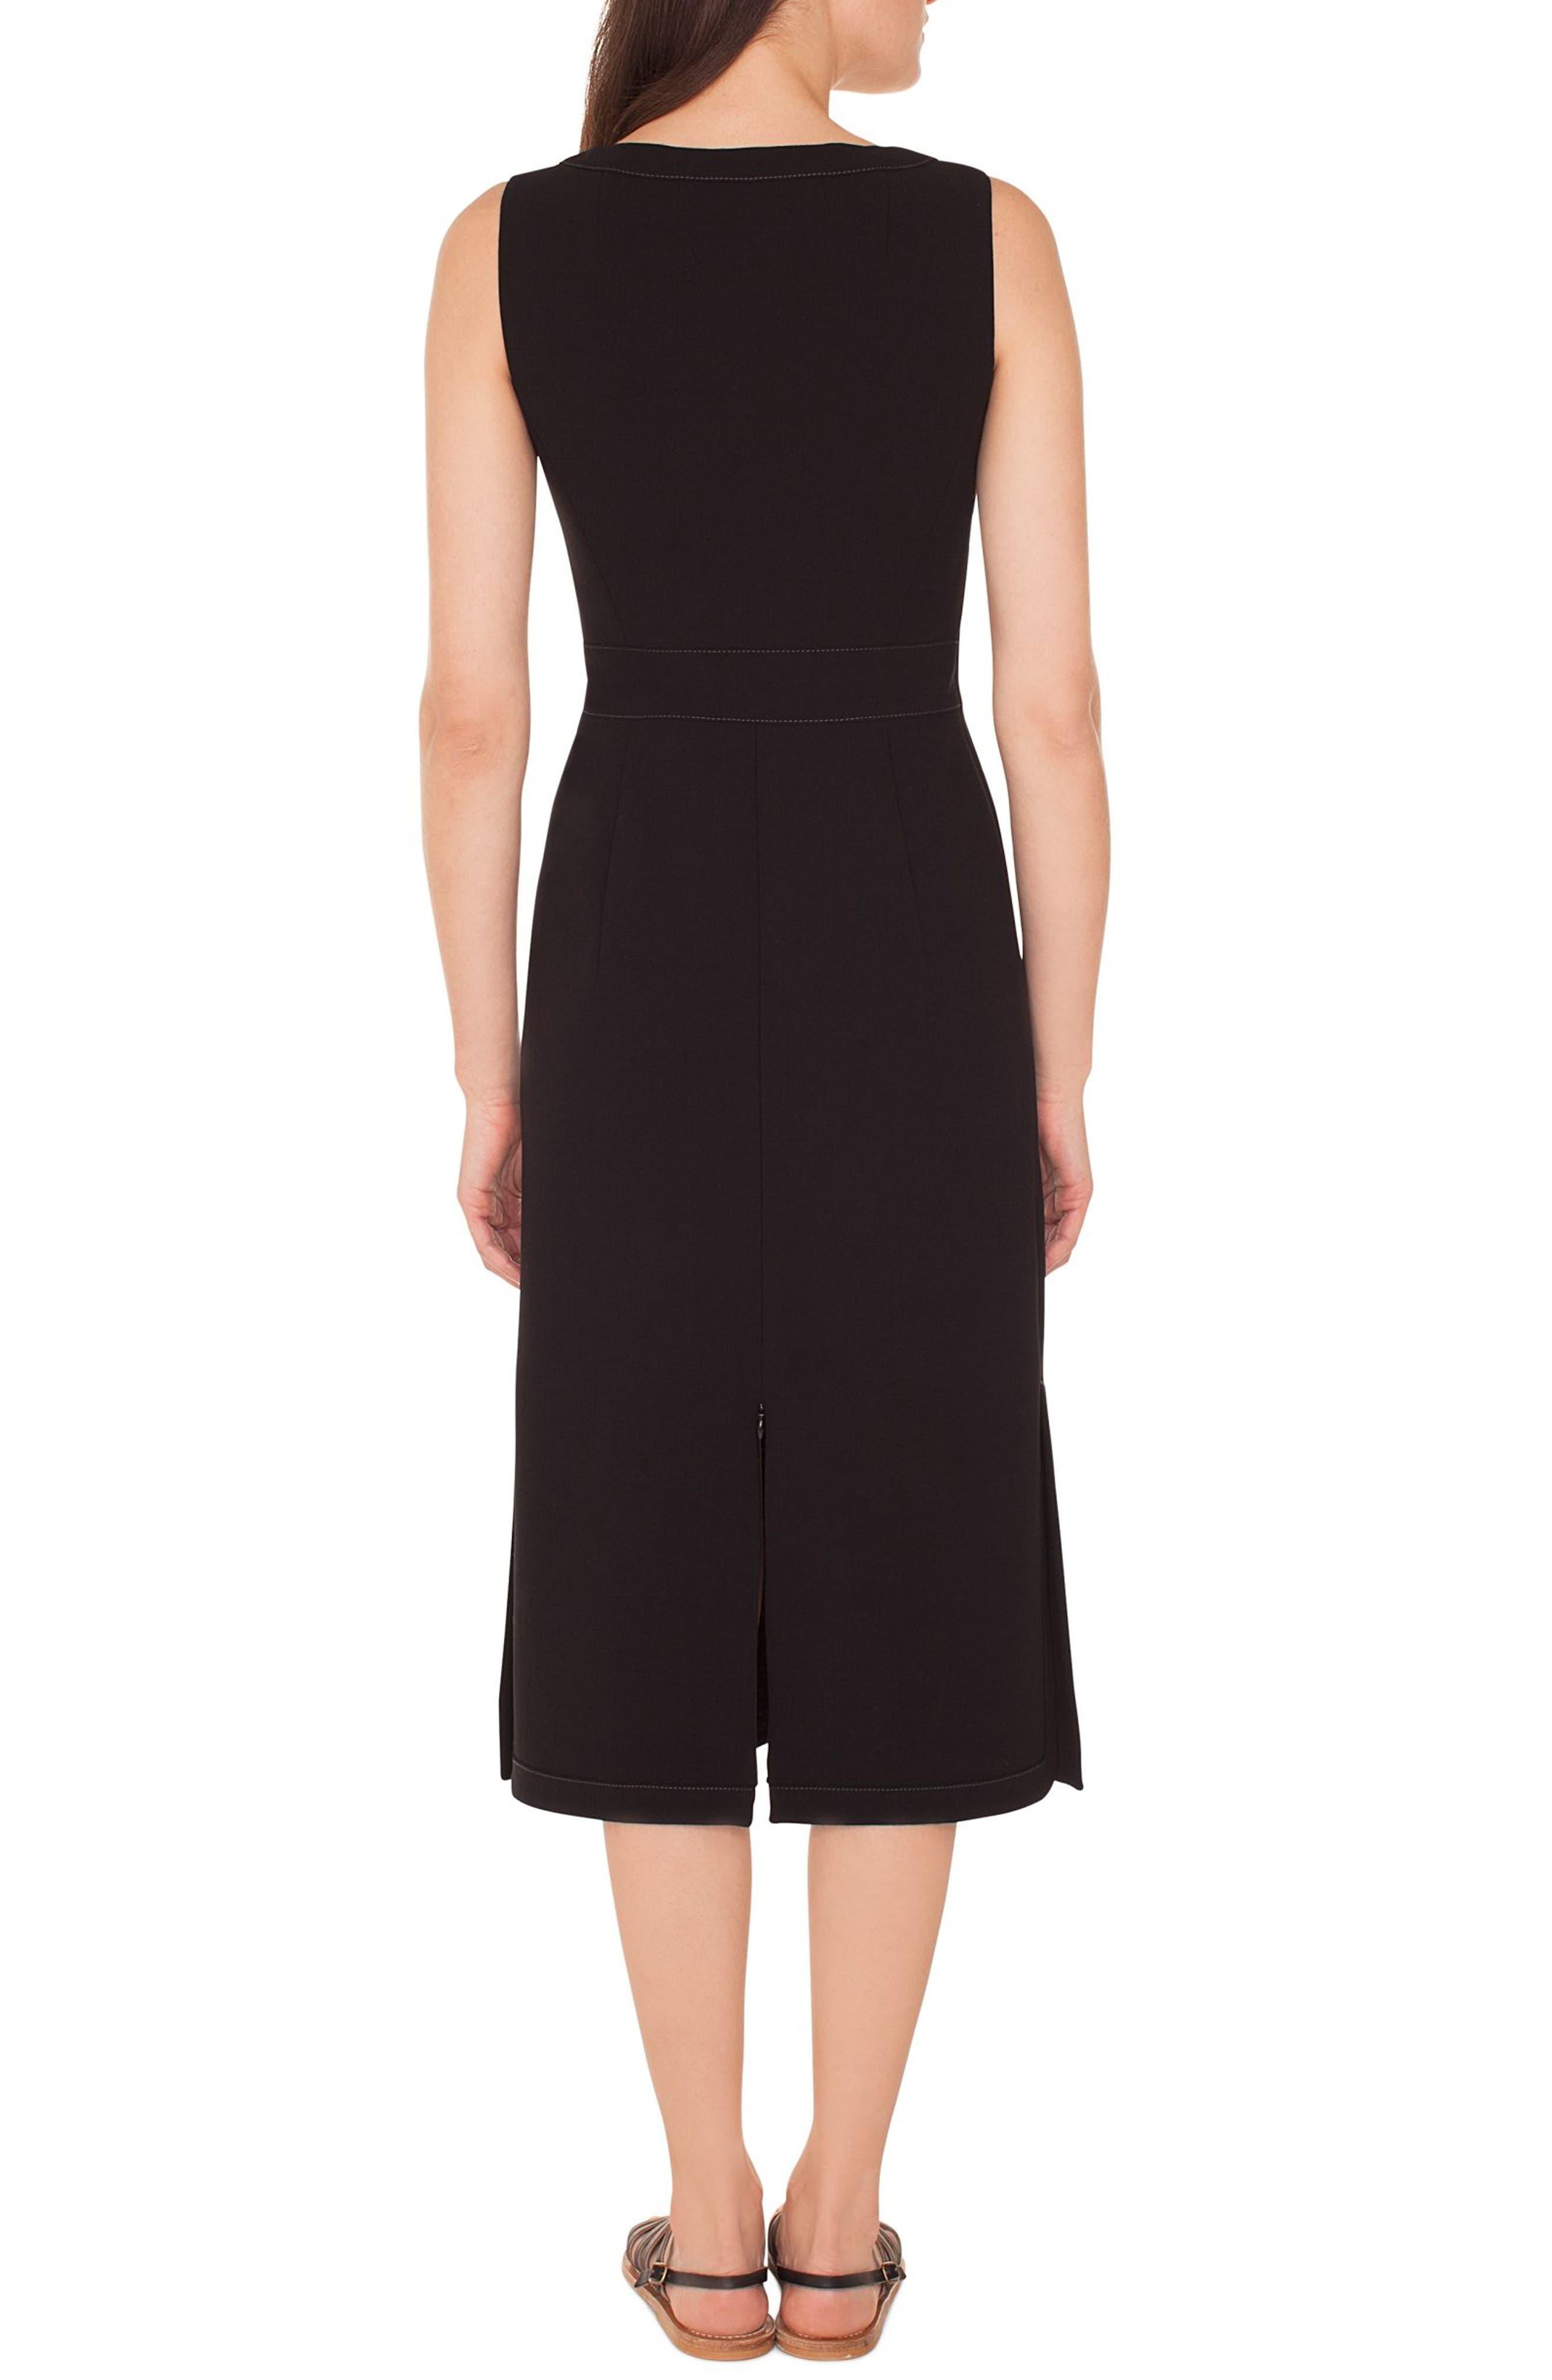 Topstitch Double Face Stretch Wool Dress,                             Alternate thumbnail 2, color,                             Black